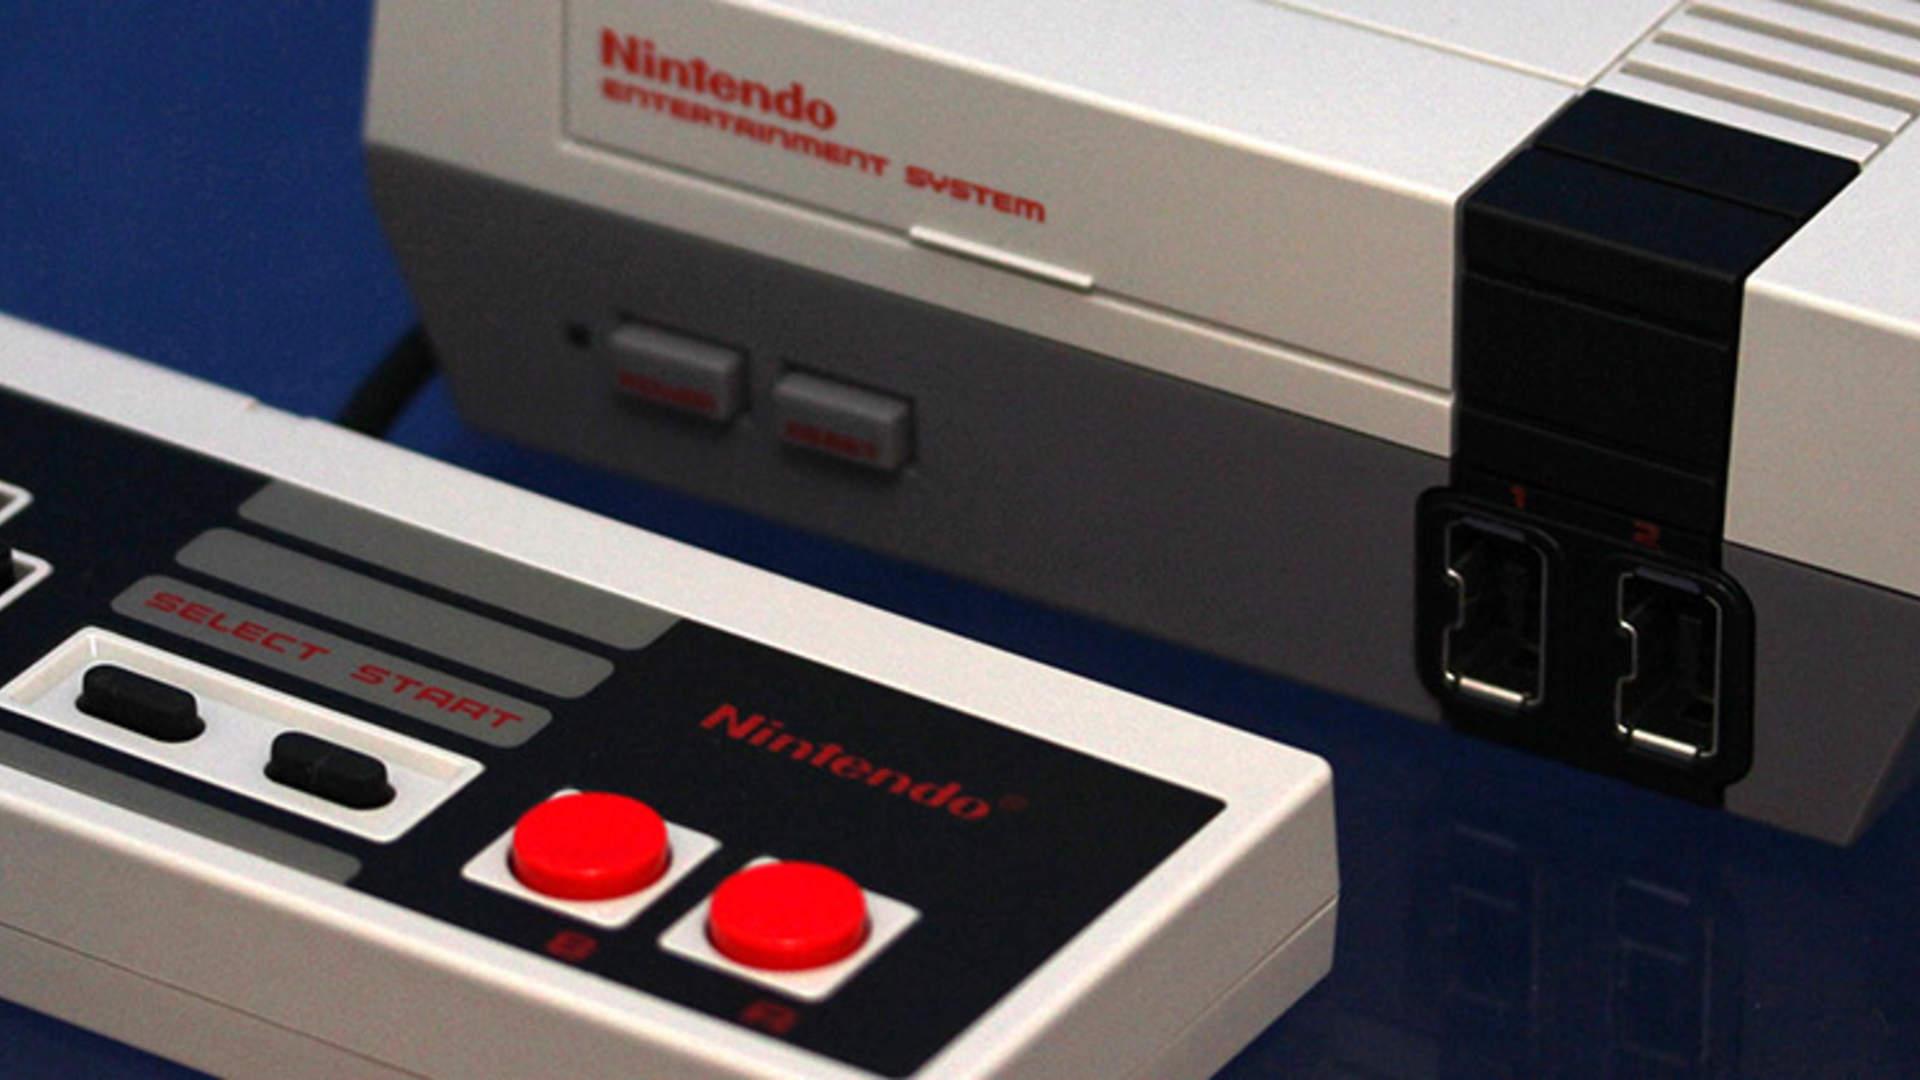 You better believe the LEGO NES set has you building a CRT TV screenshot